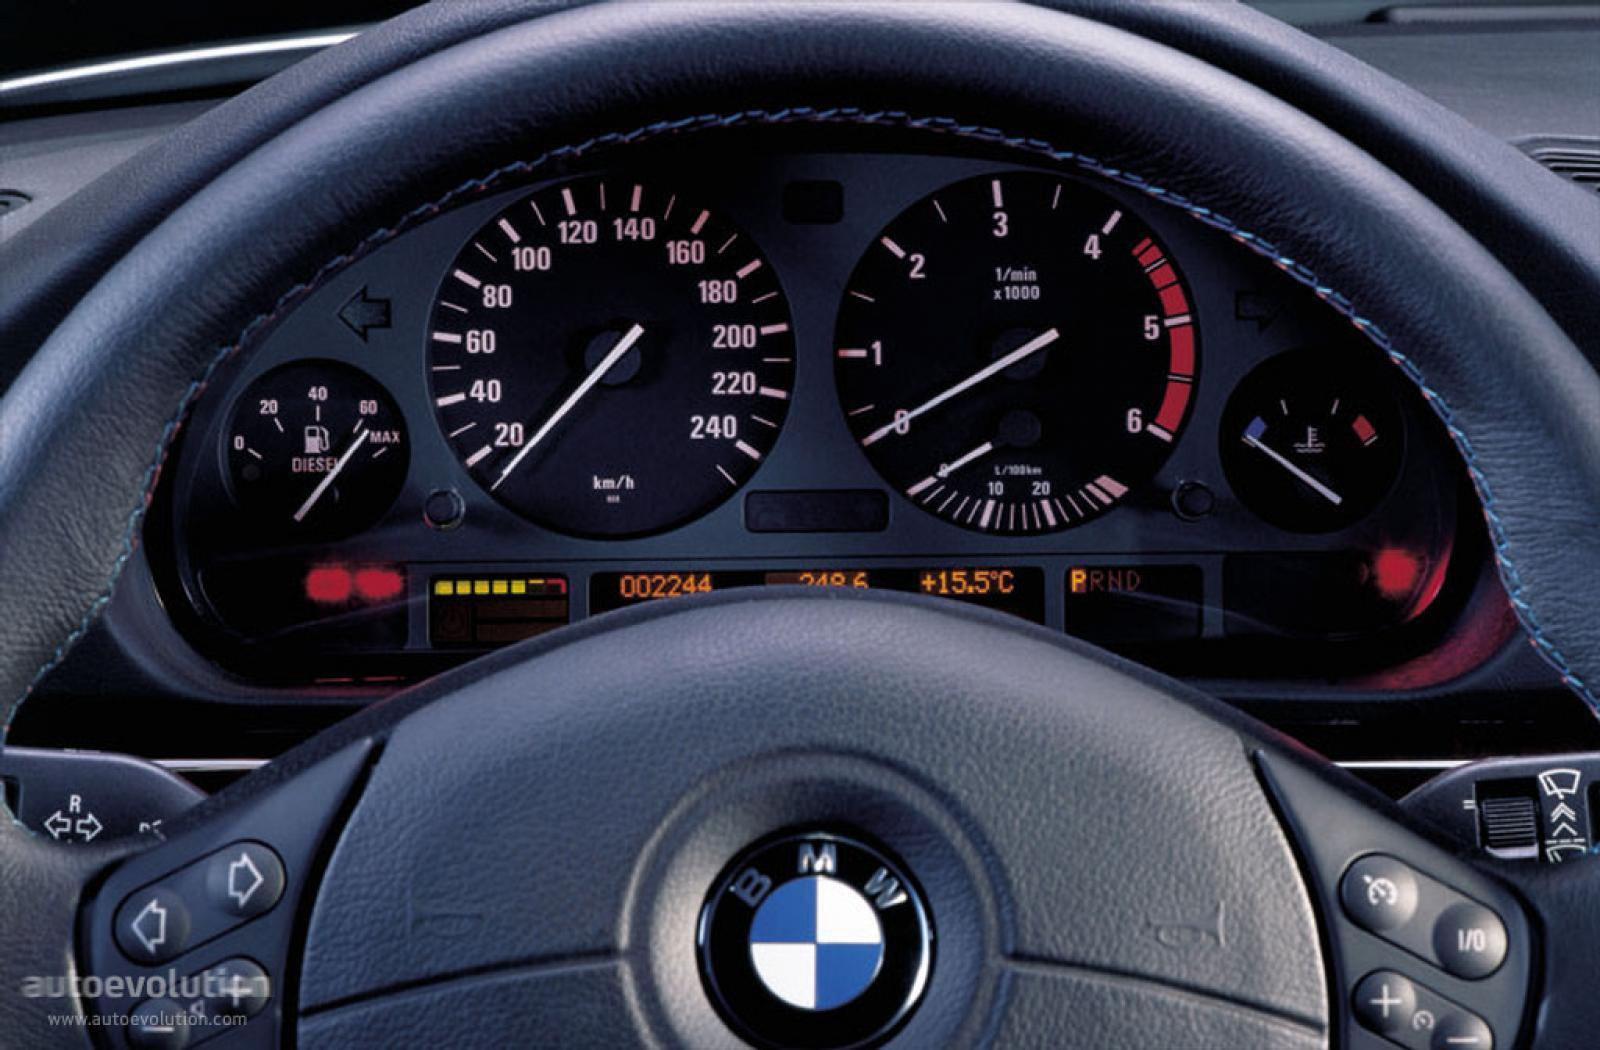 BMW 7 Series 800 1024 1280 1600 Origin